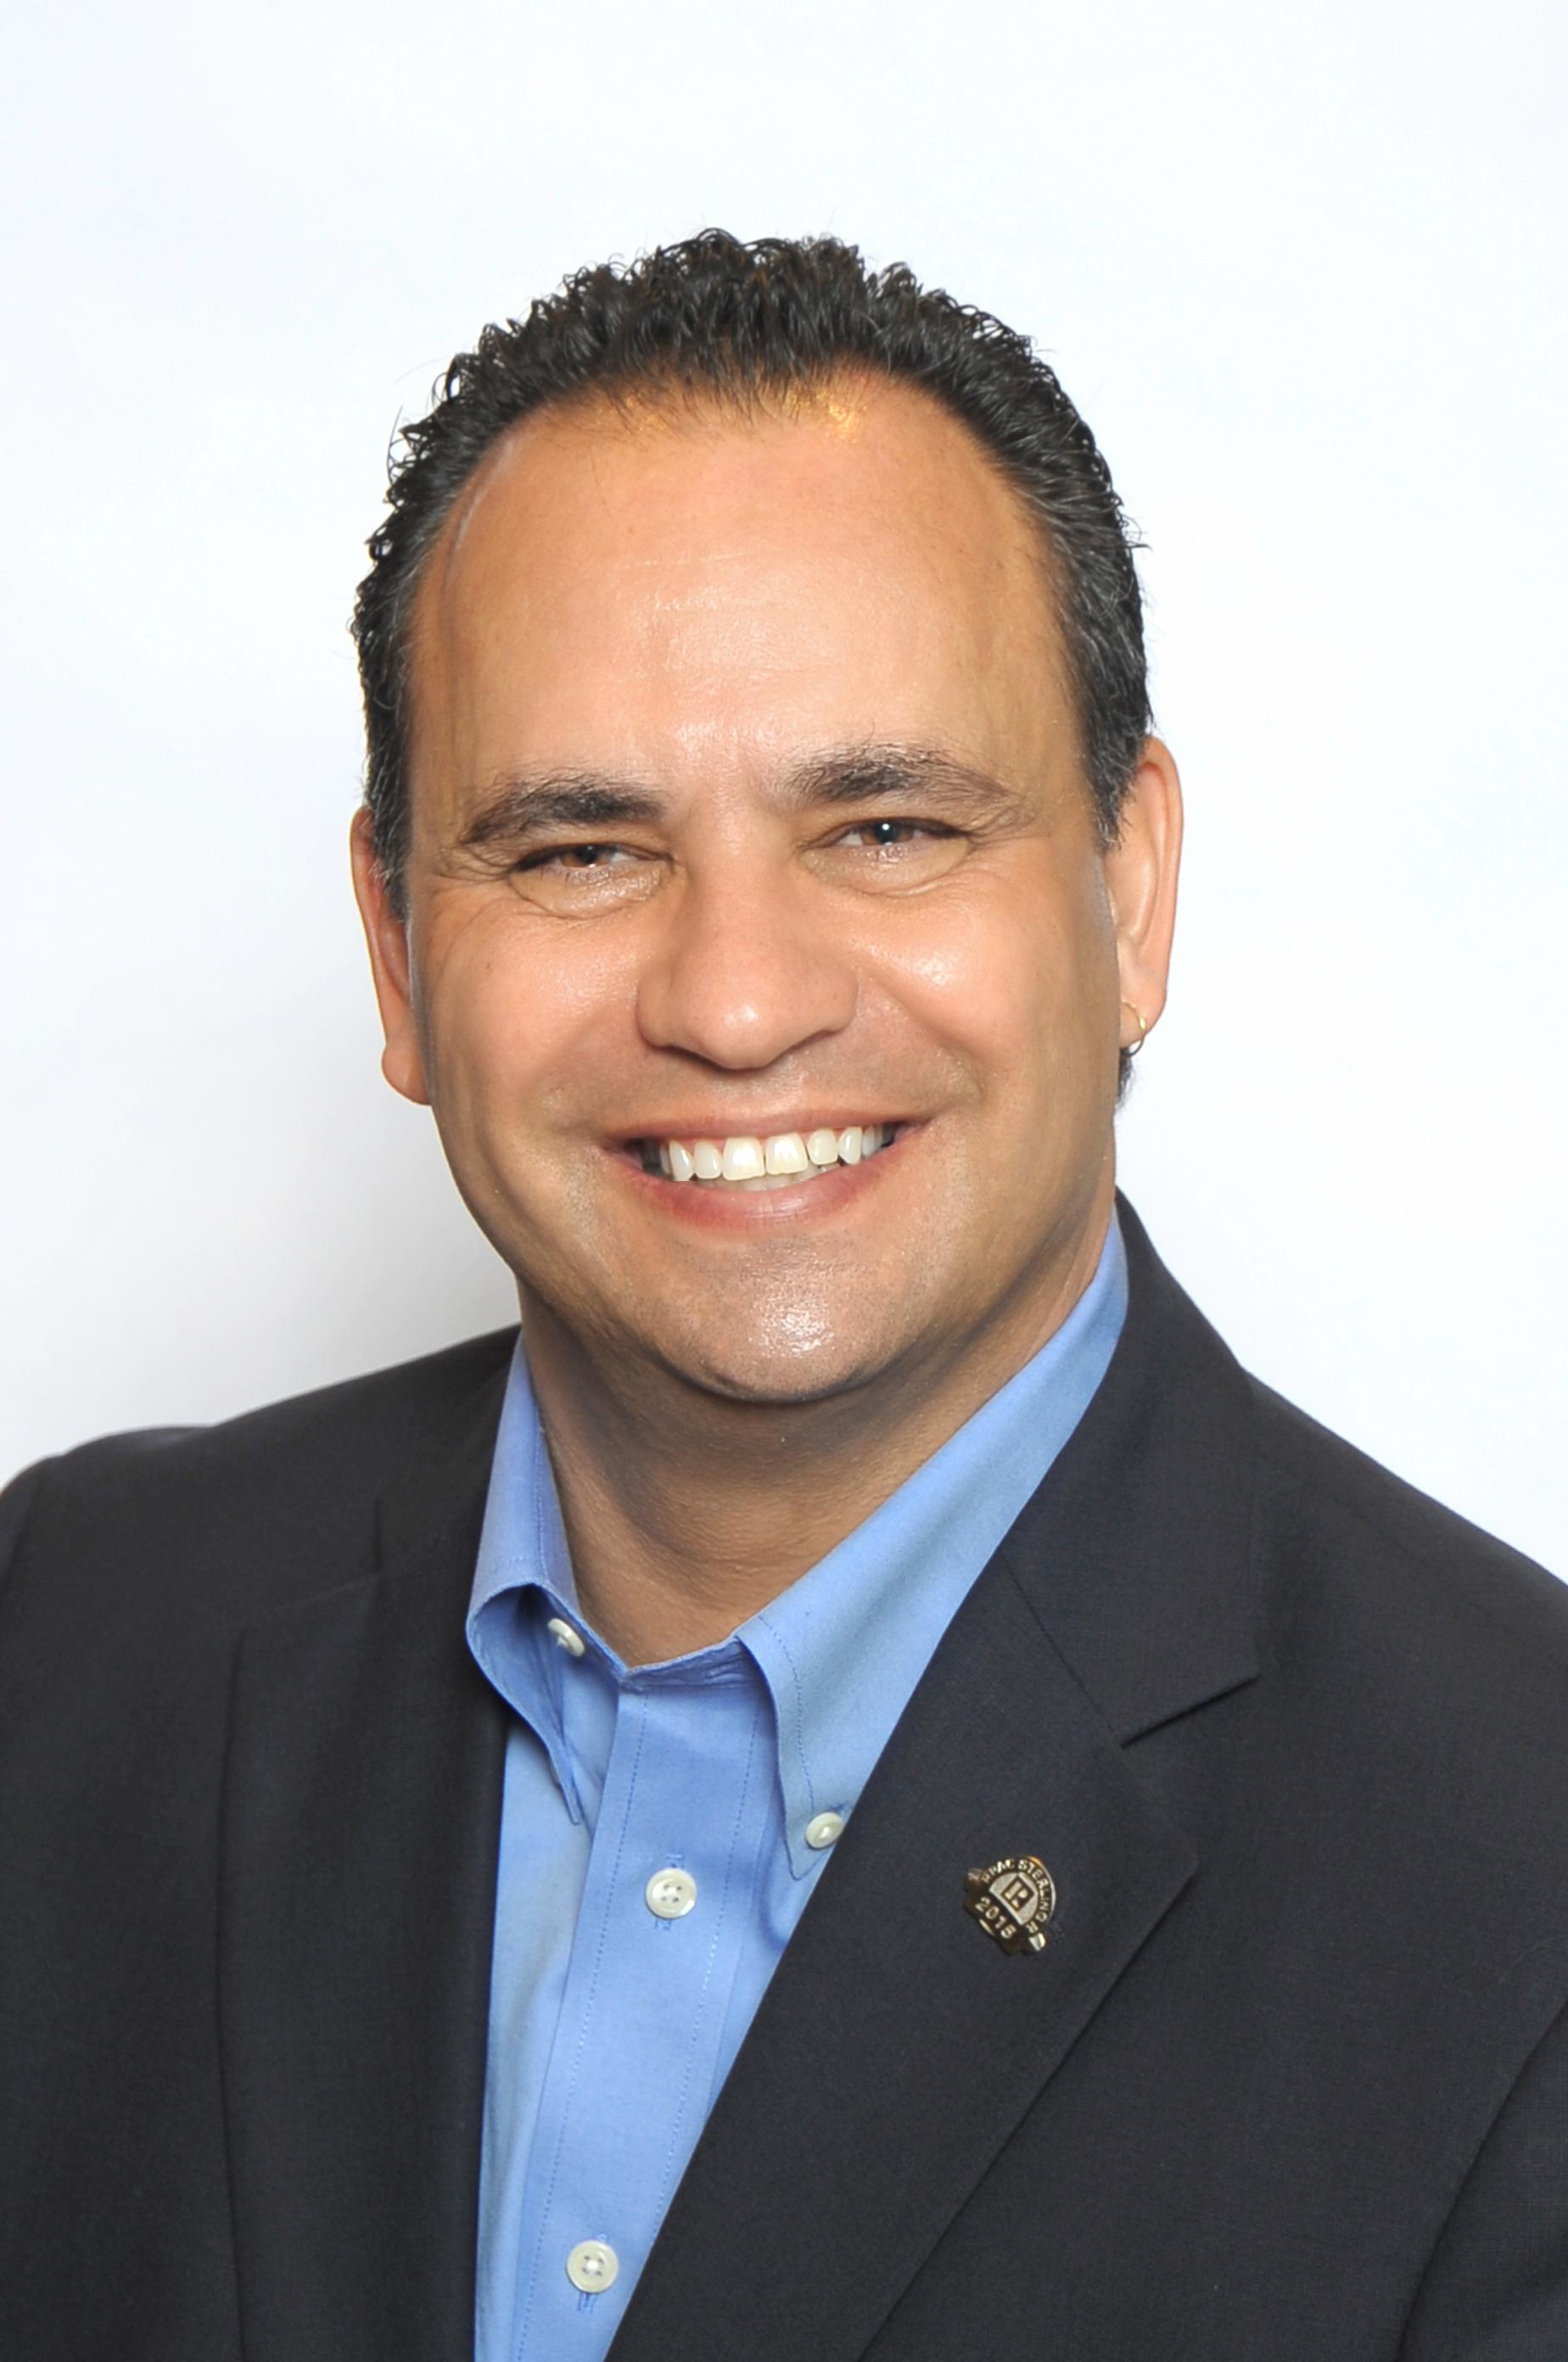 Michael Mendicino - 2018 MLSLI President